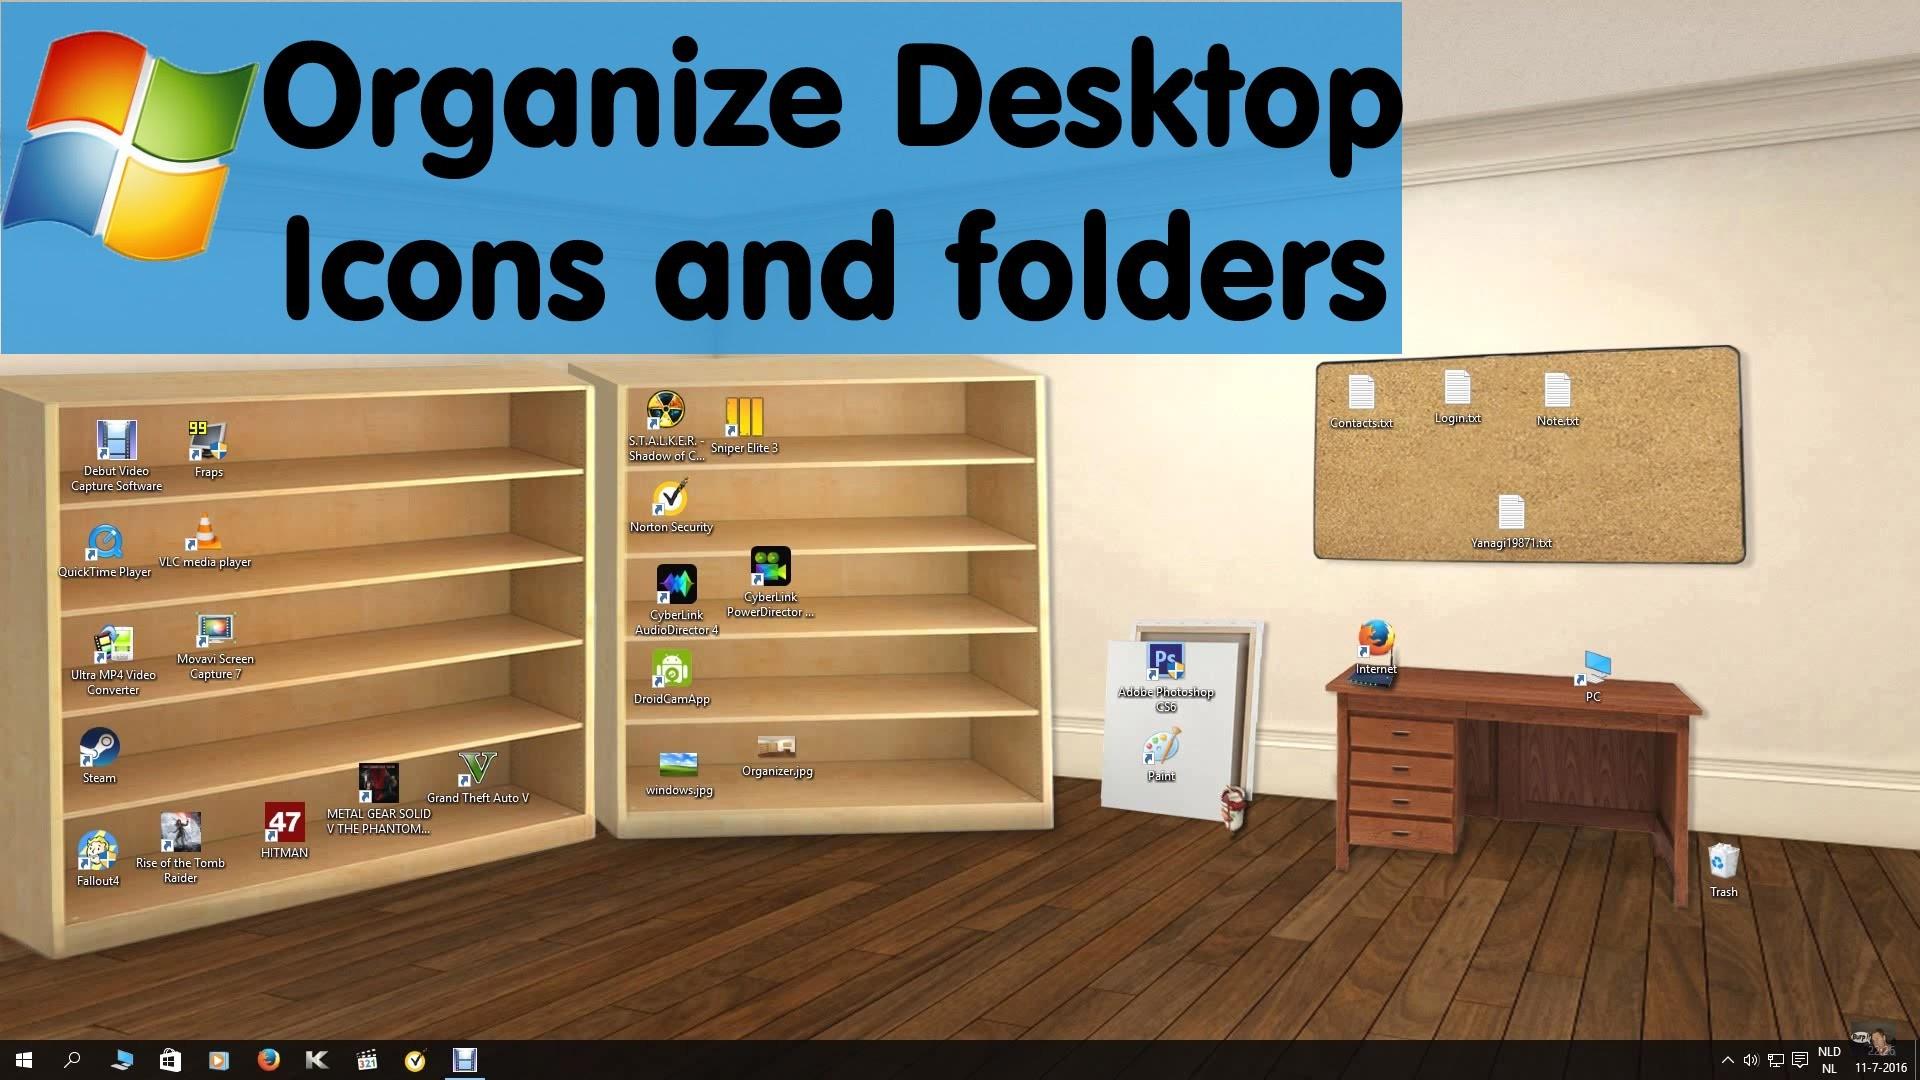 Classic 3d Desktop Workplace Wallpaper Organize Desktop Wallpaper 71 Images